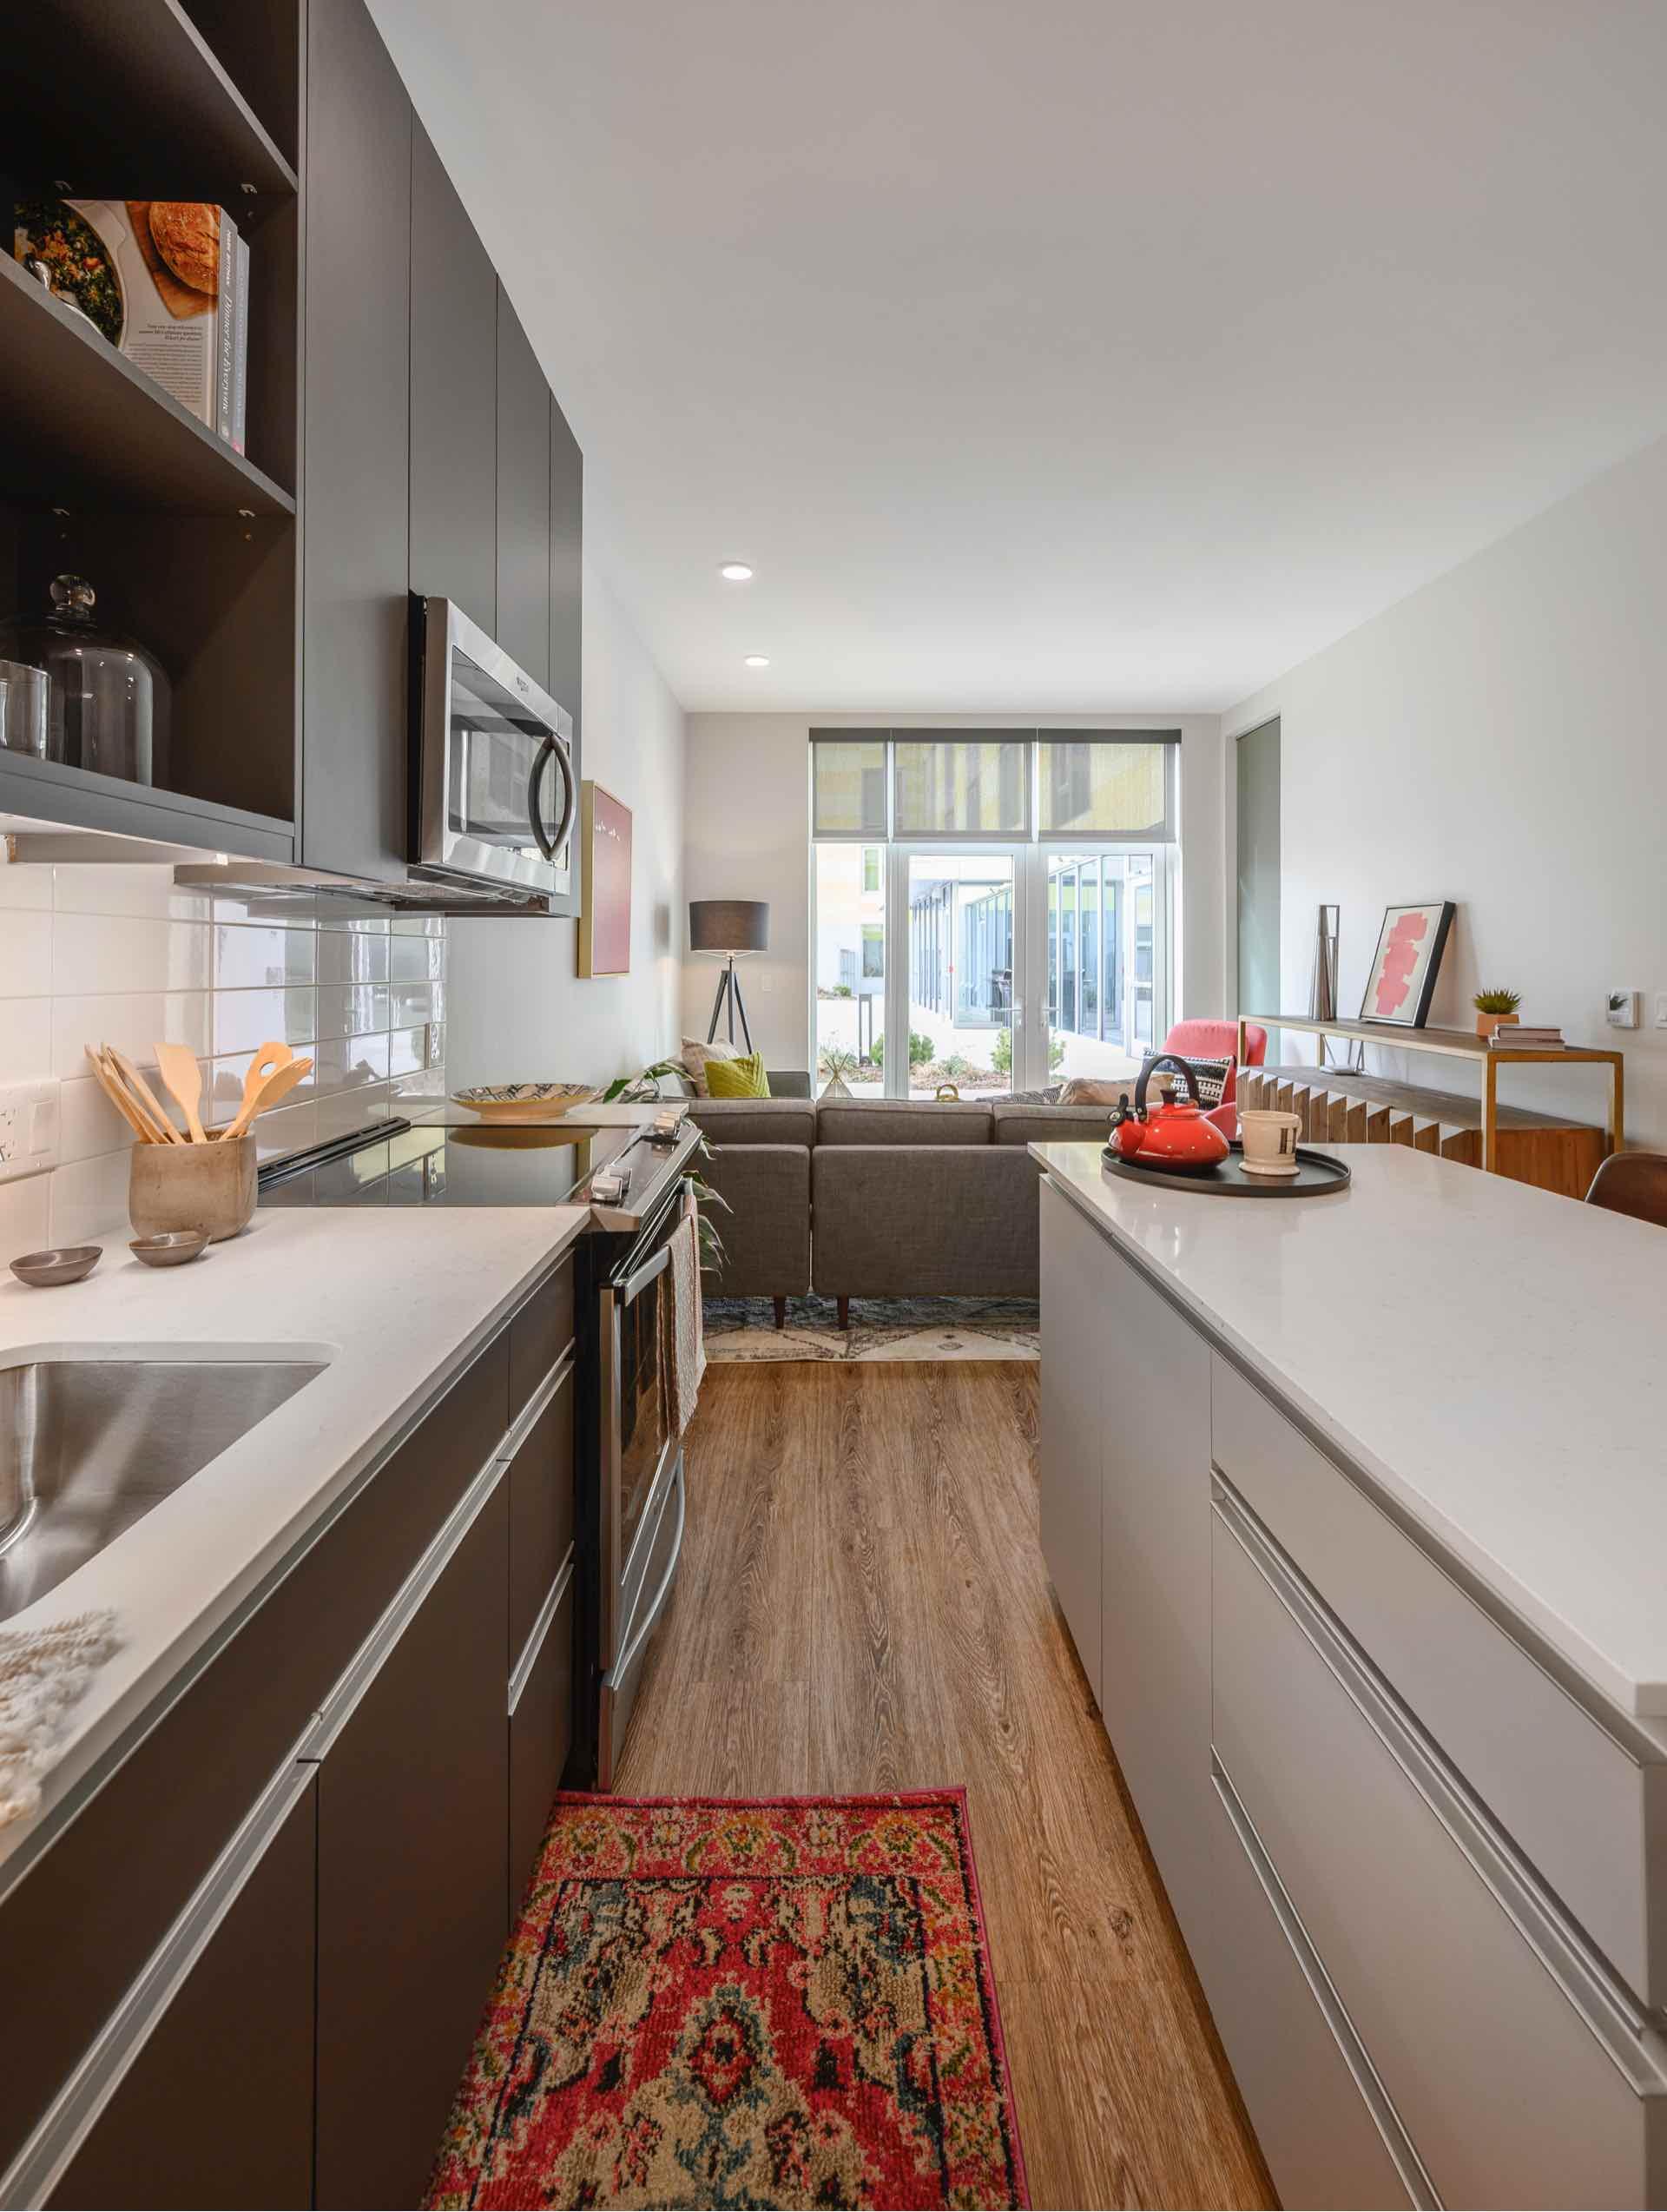 Apartments img 7